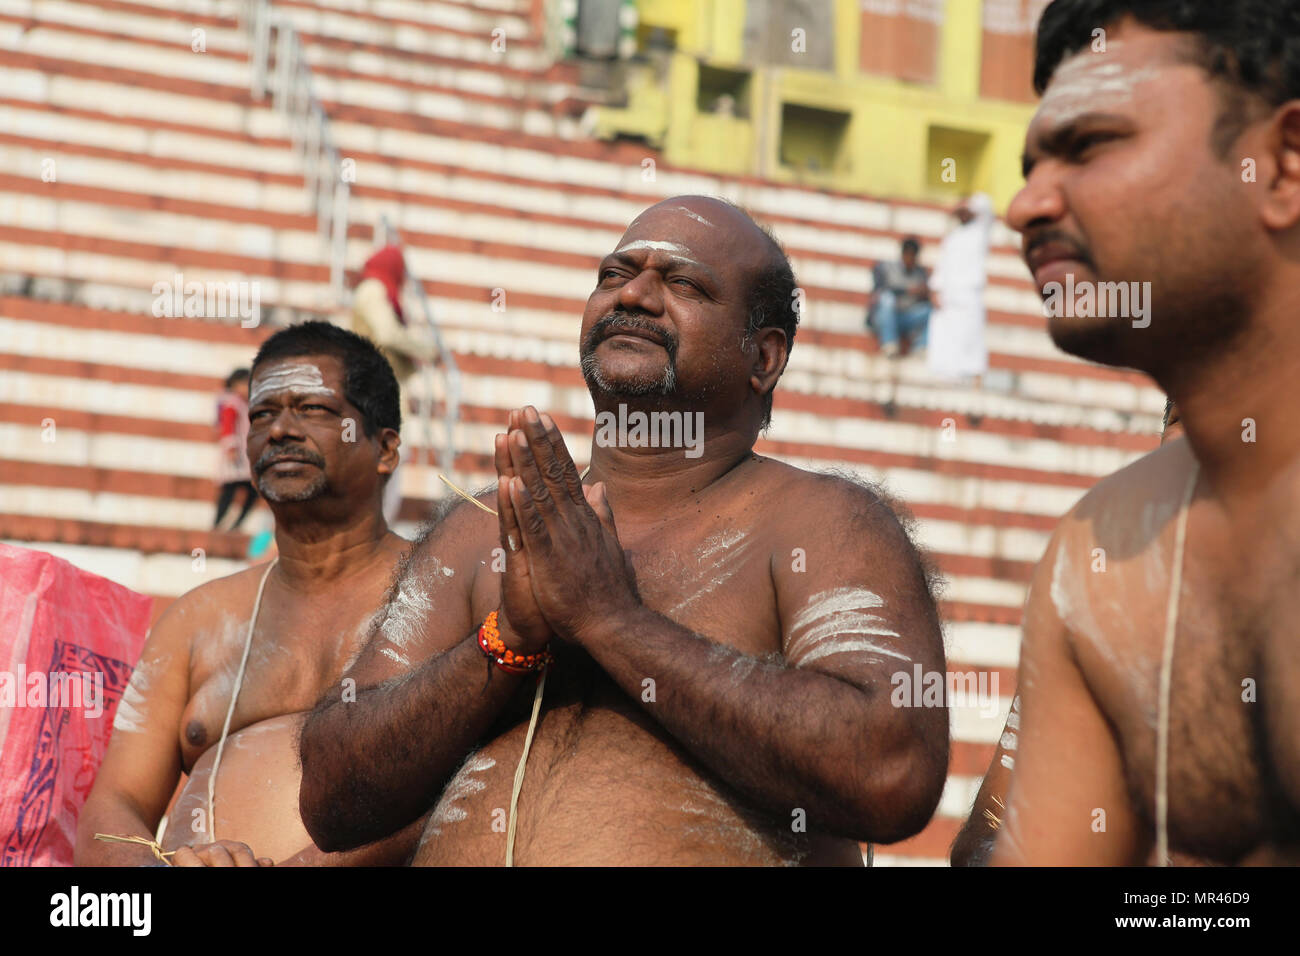 India, Uttar Pradesh, Varanasi, A bereaved man praying at Kedar Ghat. - Stock Image